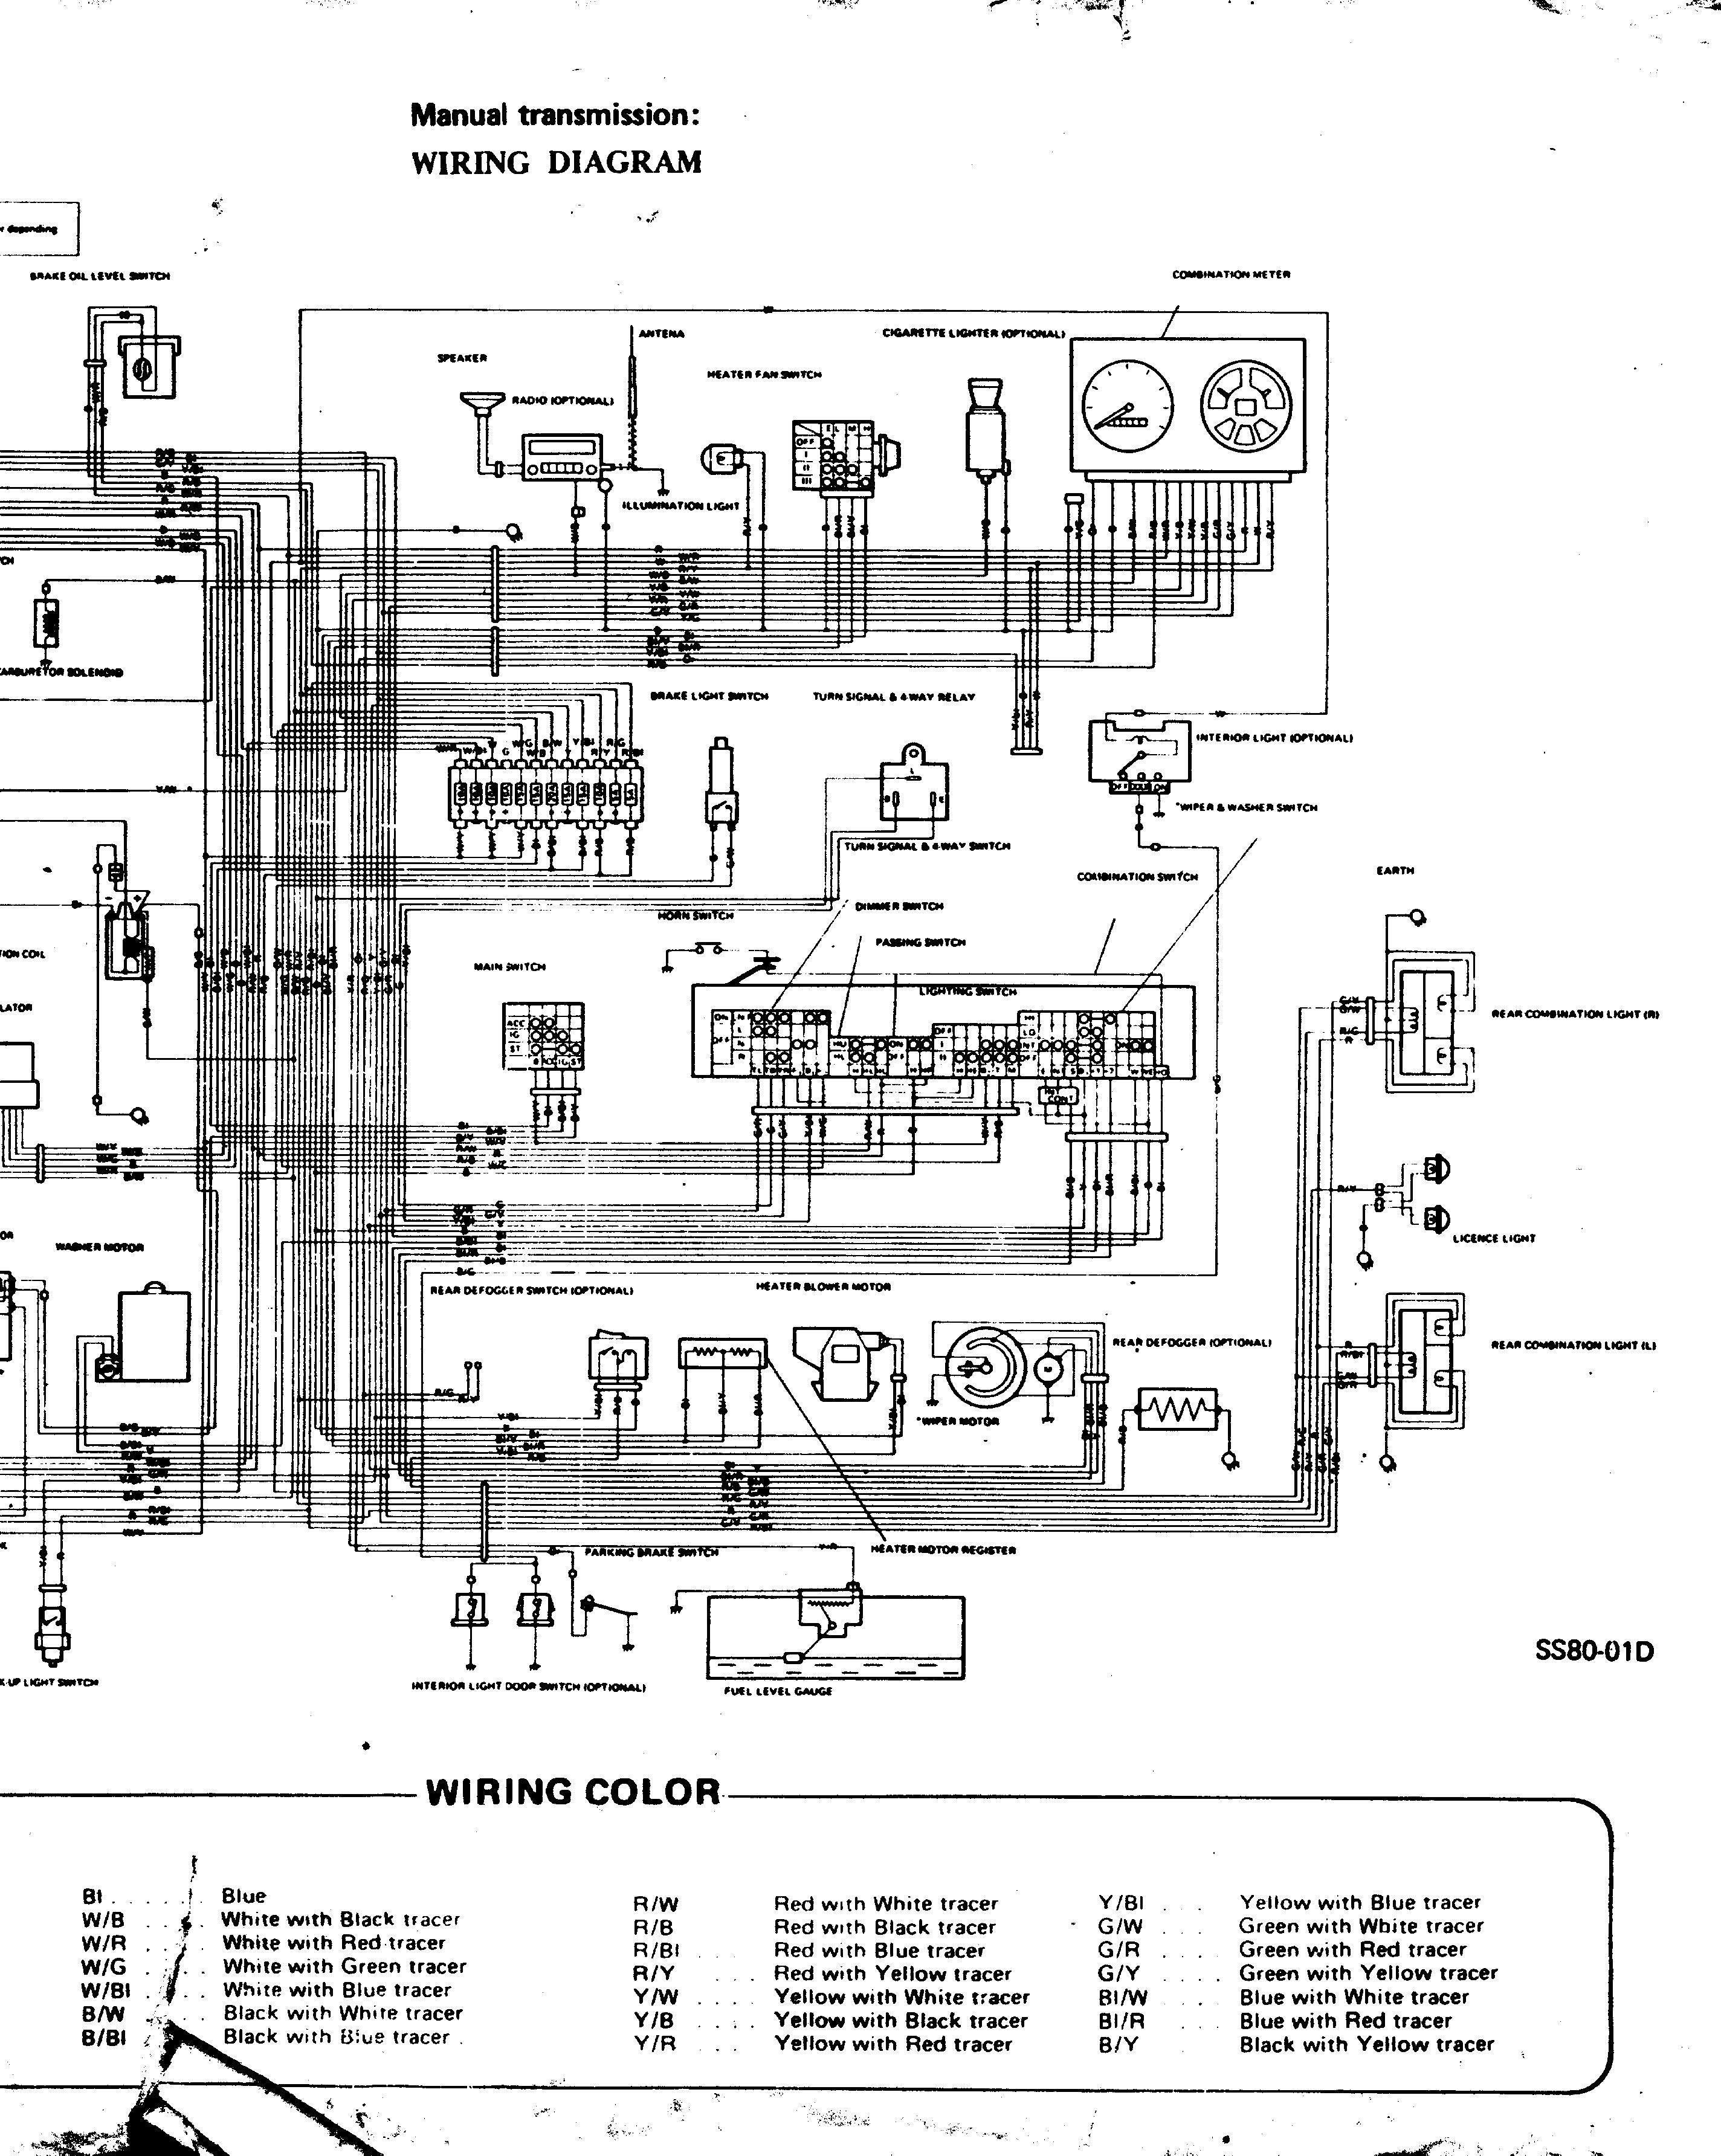 Ford F650 Wiring Diagram Simple Schema 2008 Fuse Harness Schematic Cat C7 Under Hood